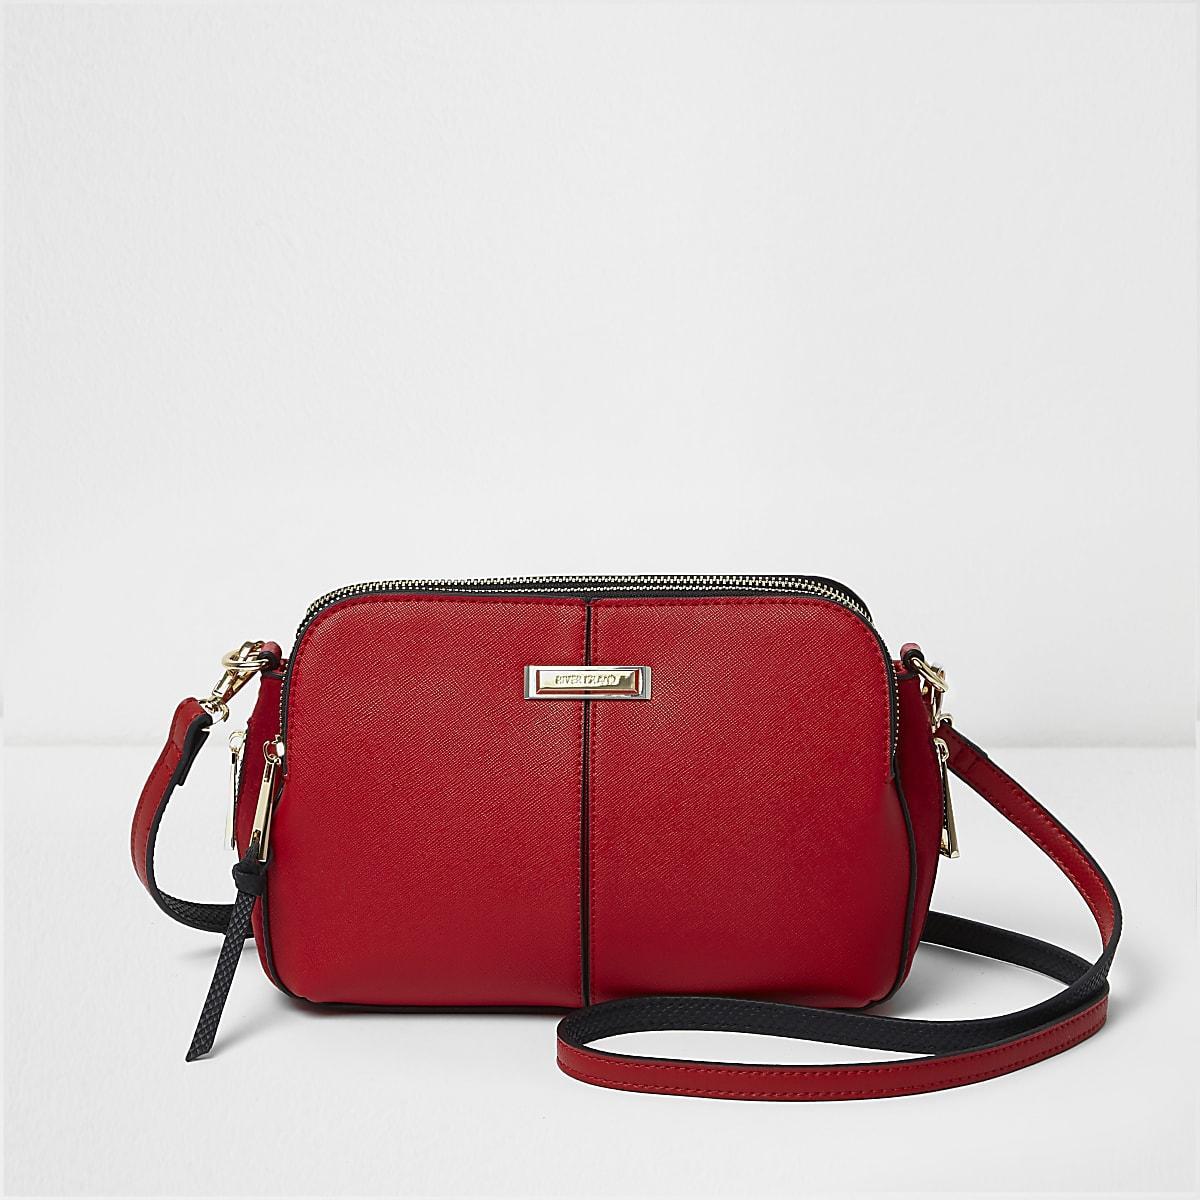 e71c8418effb Red triple compartment cross body bag - Singles Day - women